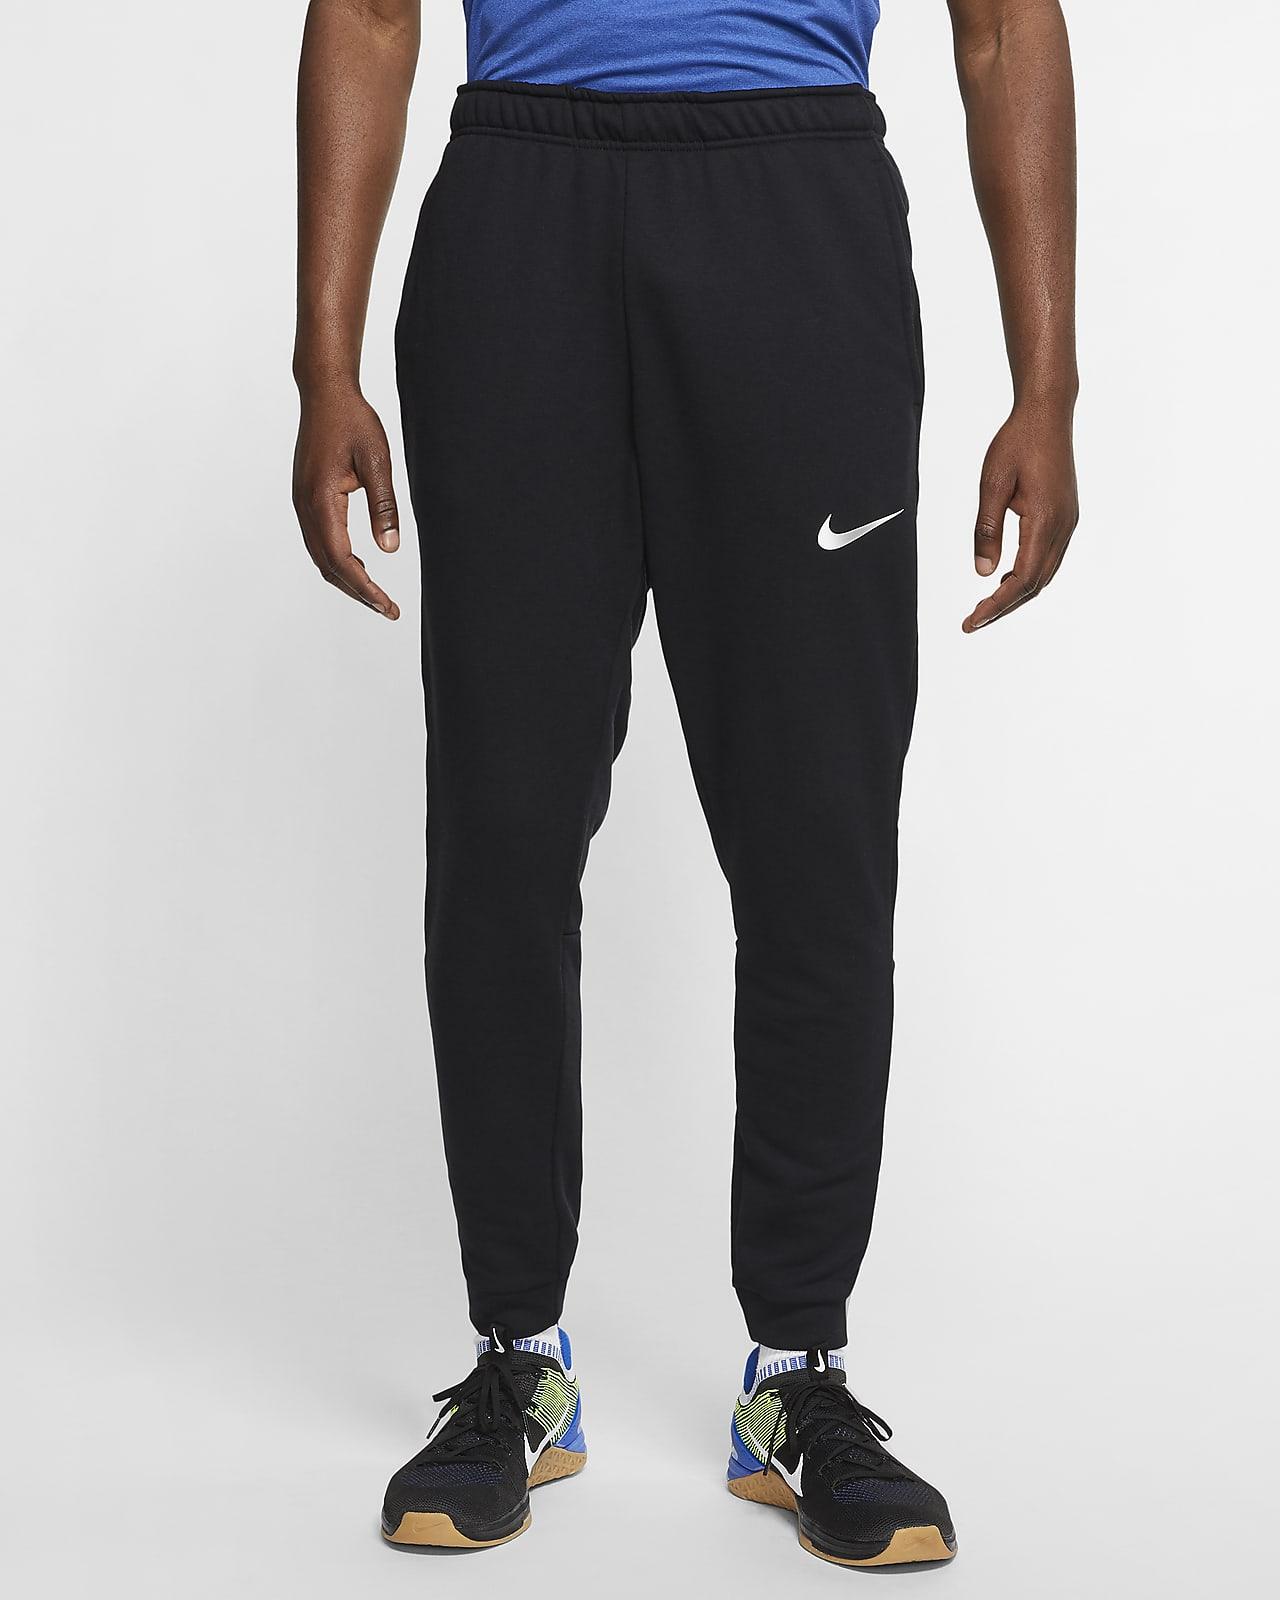 صالة القدوم ذروة Pantalon Nike Dry Fit Hombre Psidiagnosticins Com